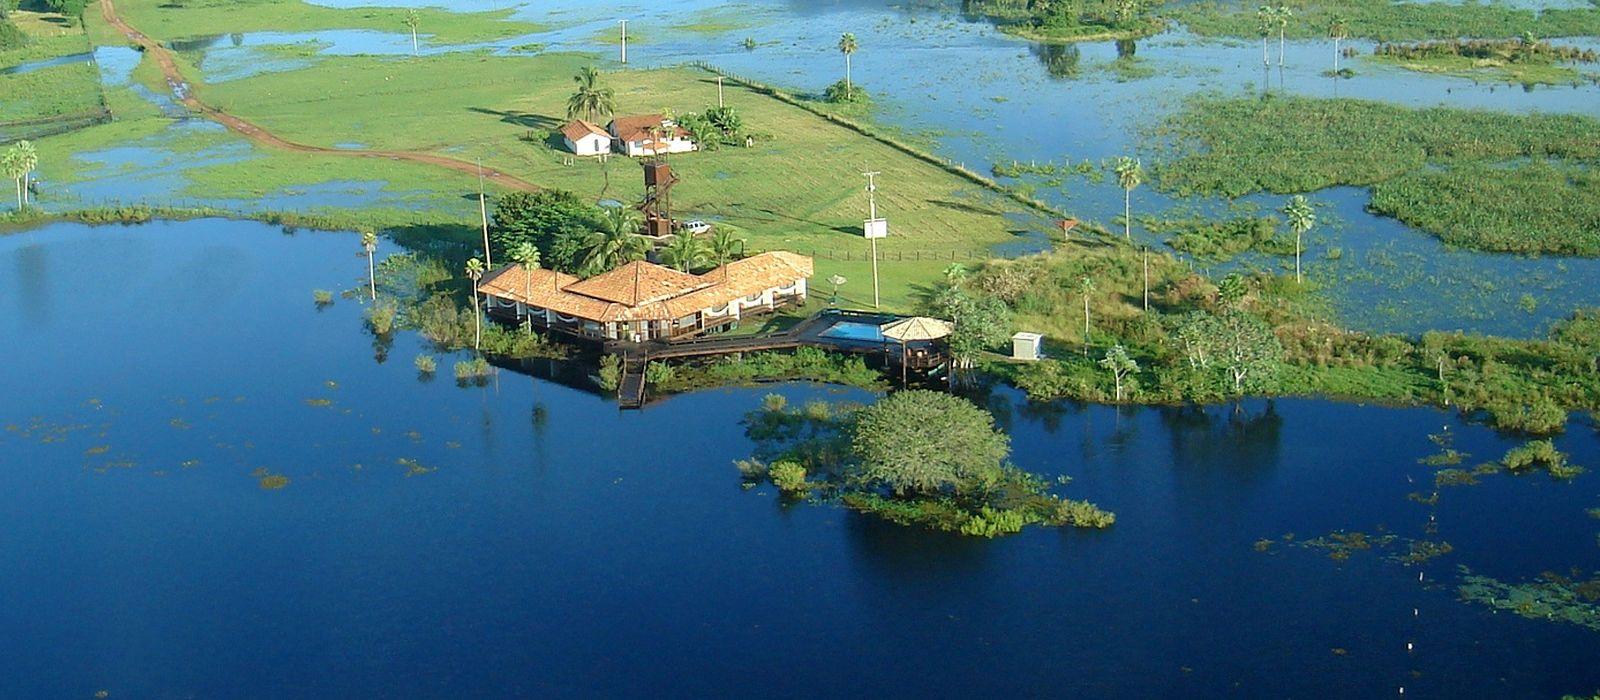 Hotel Caiman Ecological Refuge Baiazinha Lodge Brasilien